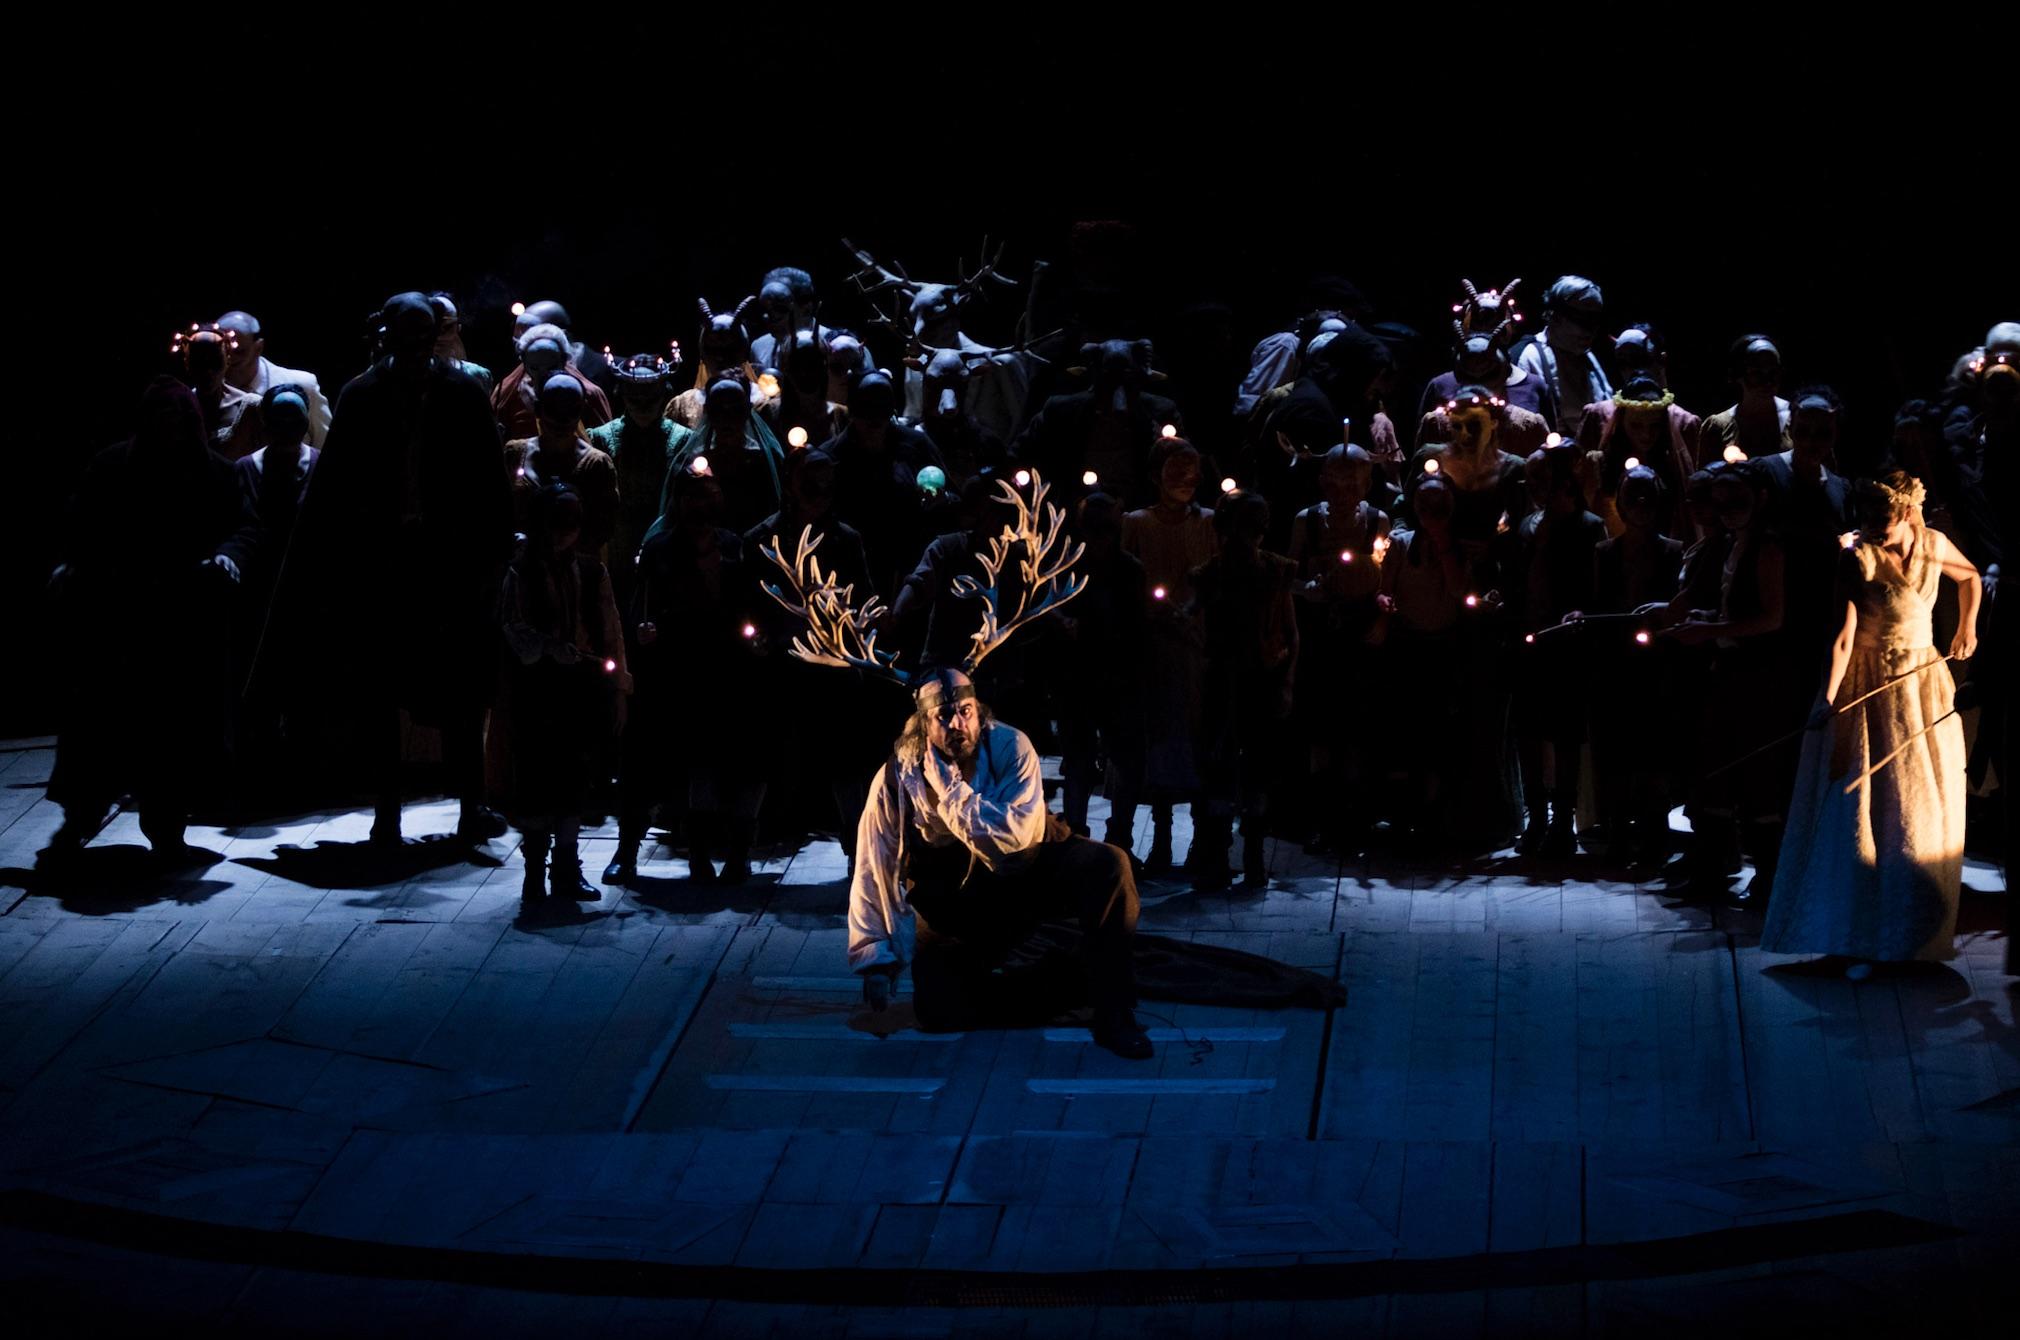 Teatro Regio, Torino, Falstaff, Giuseppe Verdi, Donato Renzetti, Carlos Alvarez, Erika Grimaldi, Daniele Abbado, Arrigo Boito, Falstaff Torino